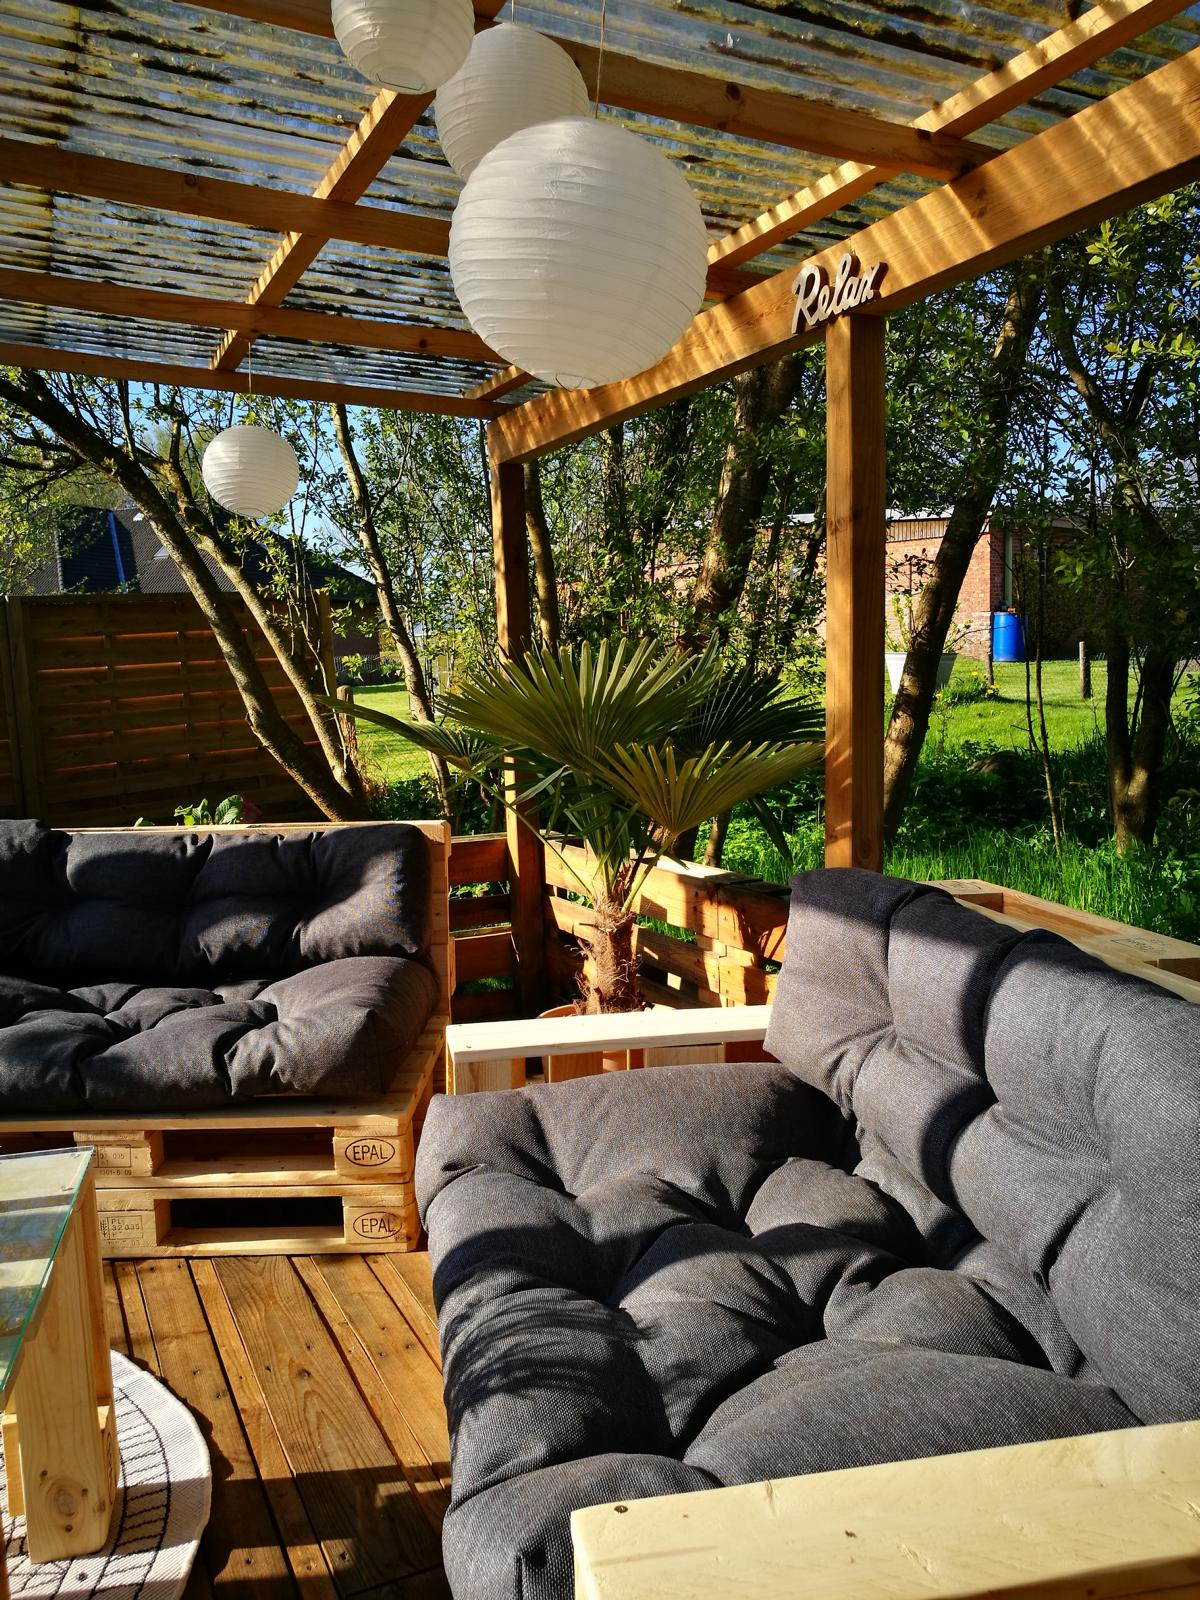 ᐅ Gartenmöbel Aus Paletten ᐅ Palettenmöbel Garten Diy Ideen Shop